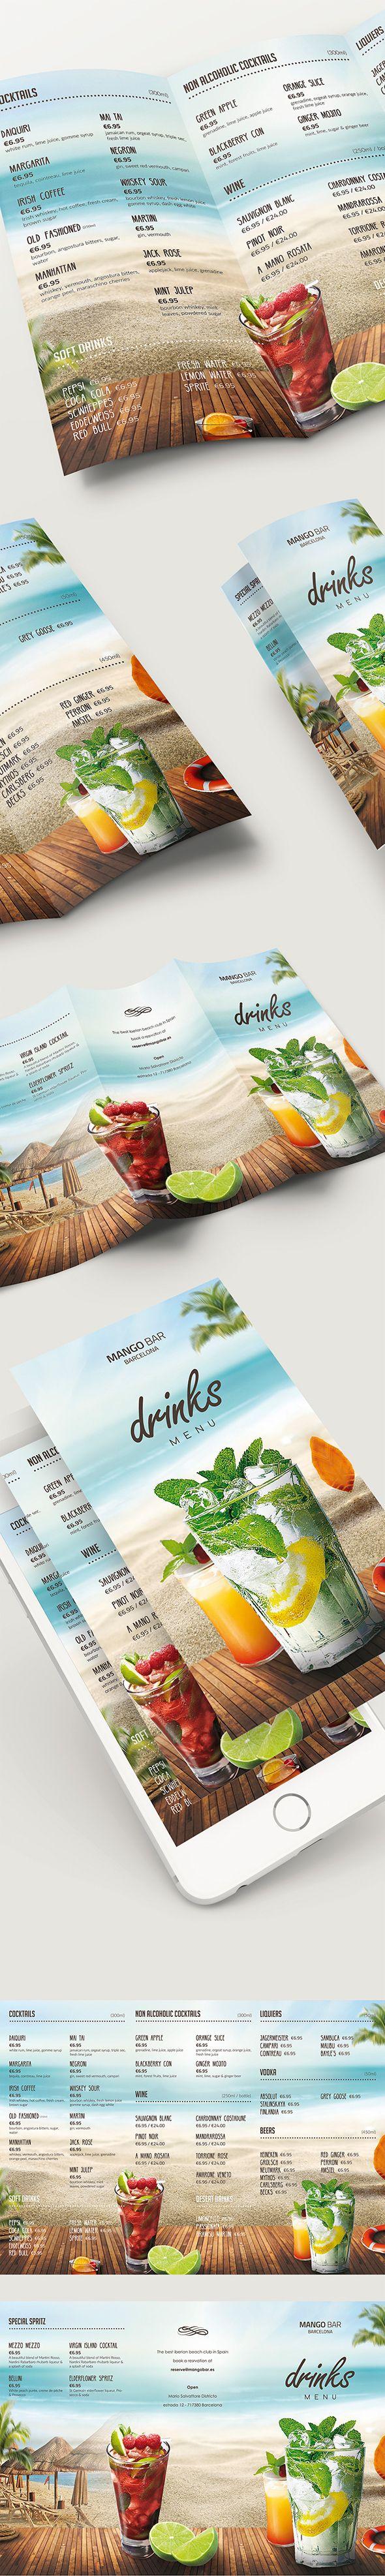 Beach Drinks Menu on Behance